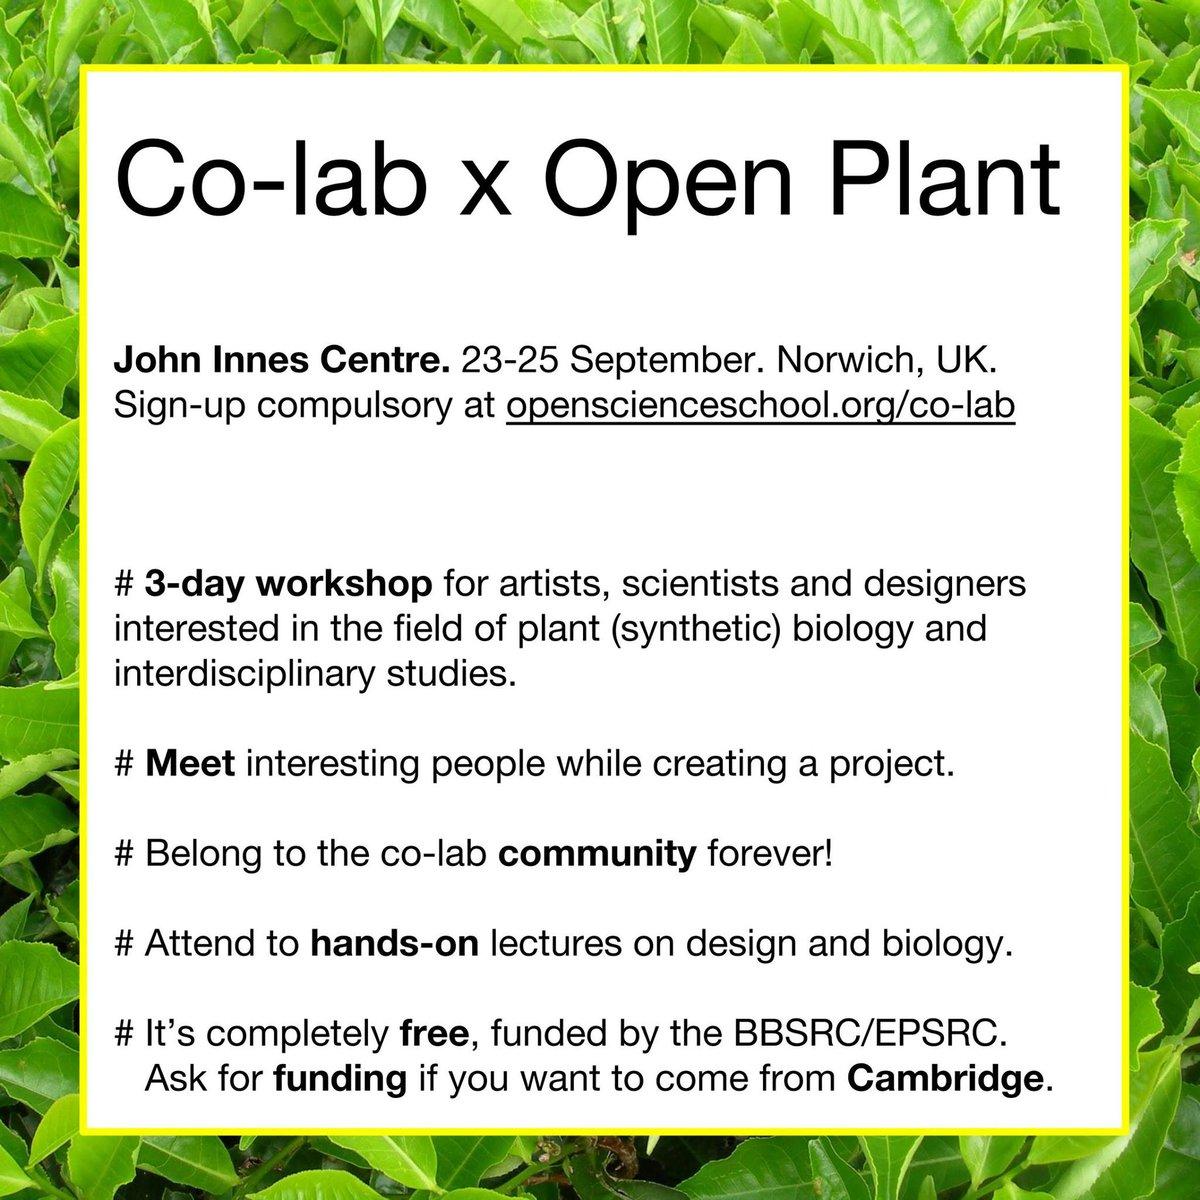 Openplant On Twitter Create Biology Art Design Projects Co